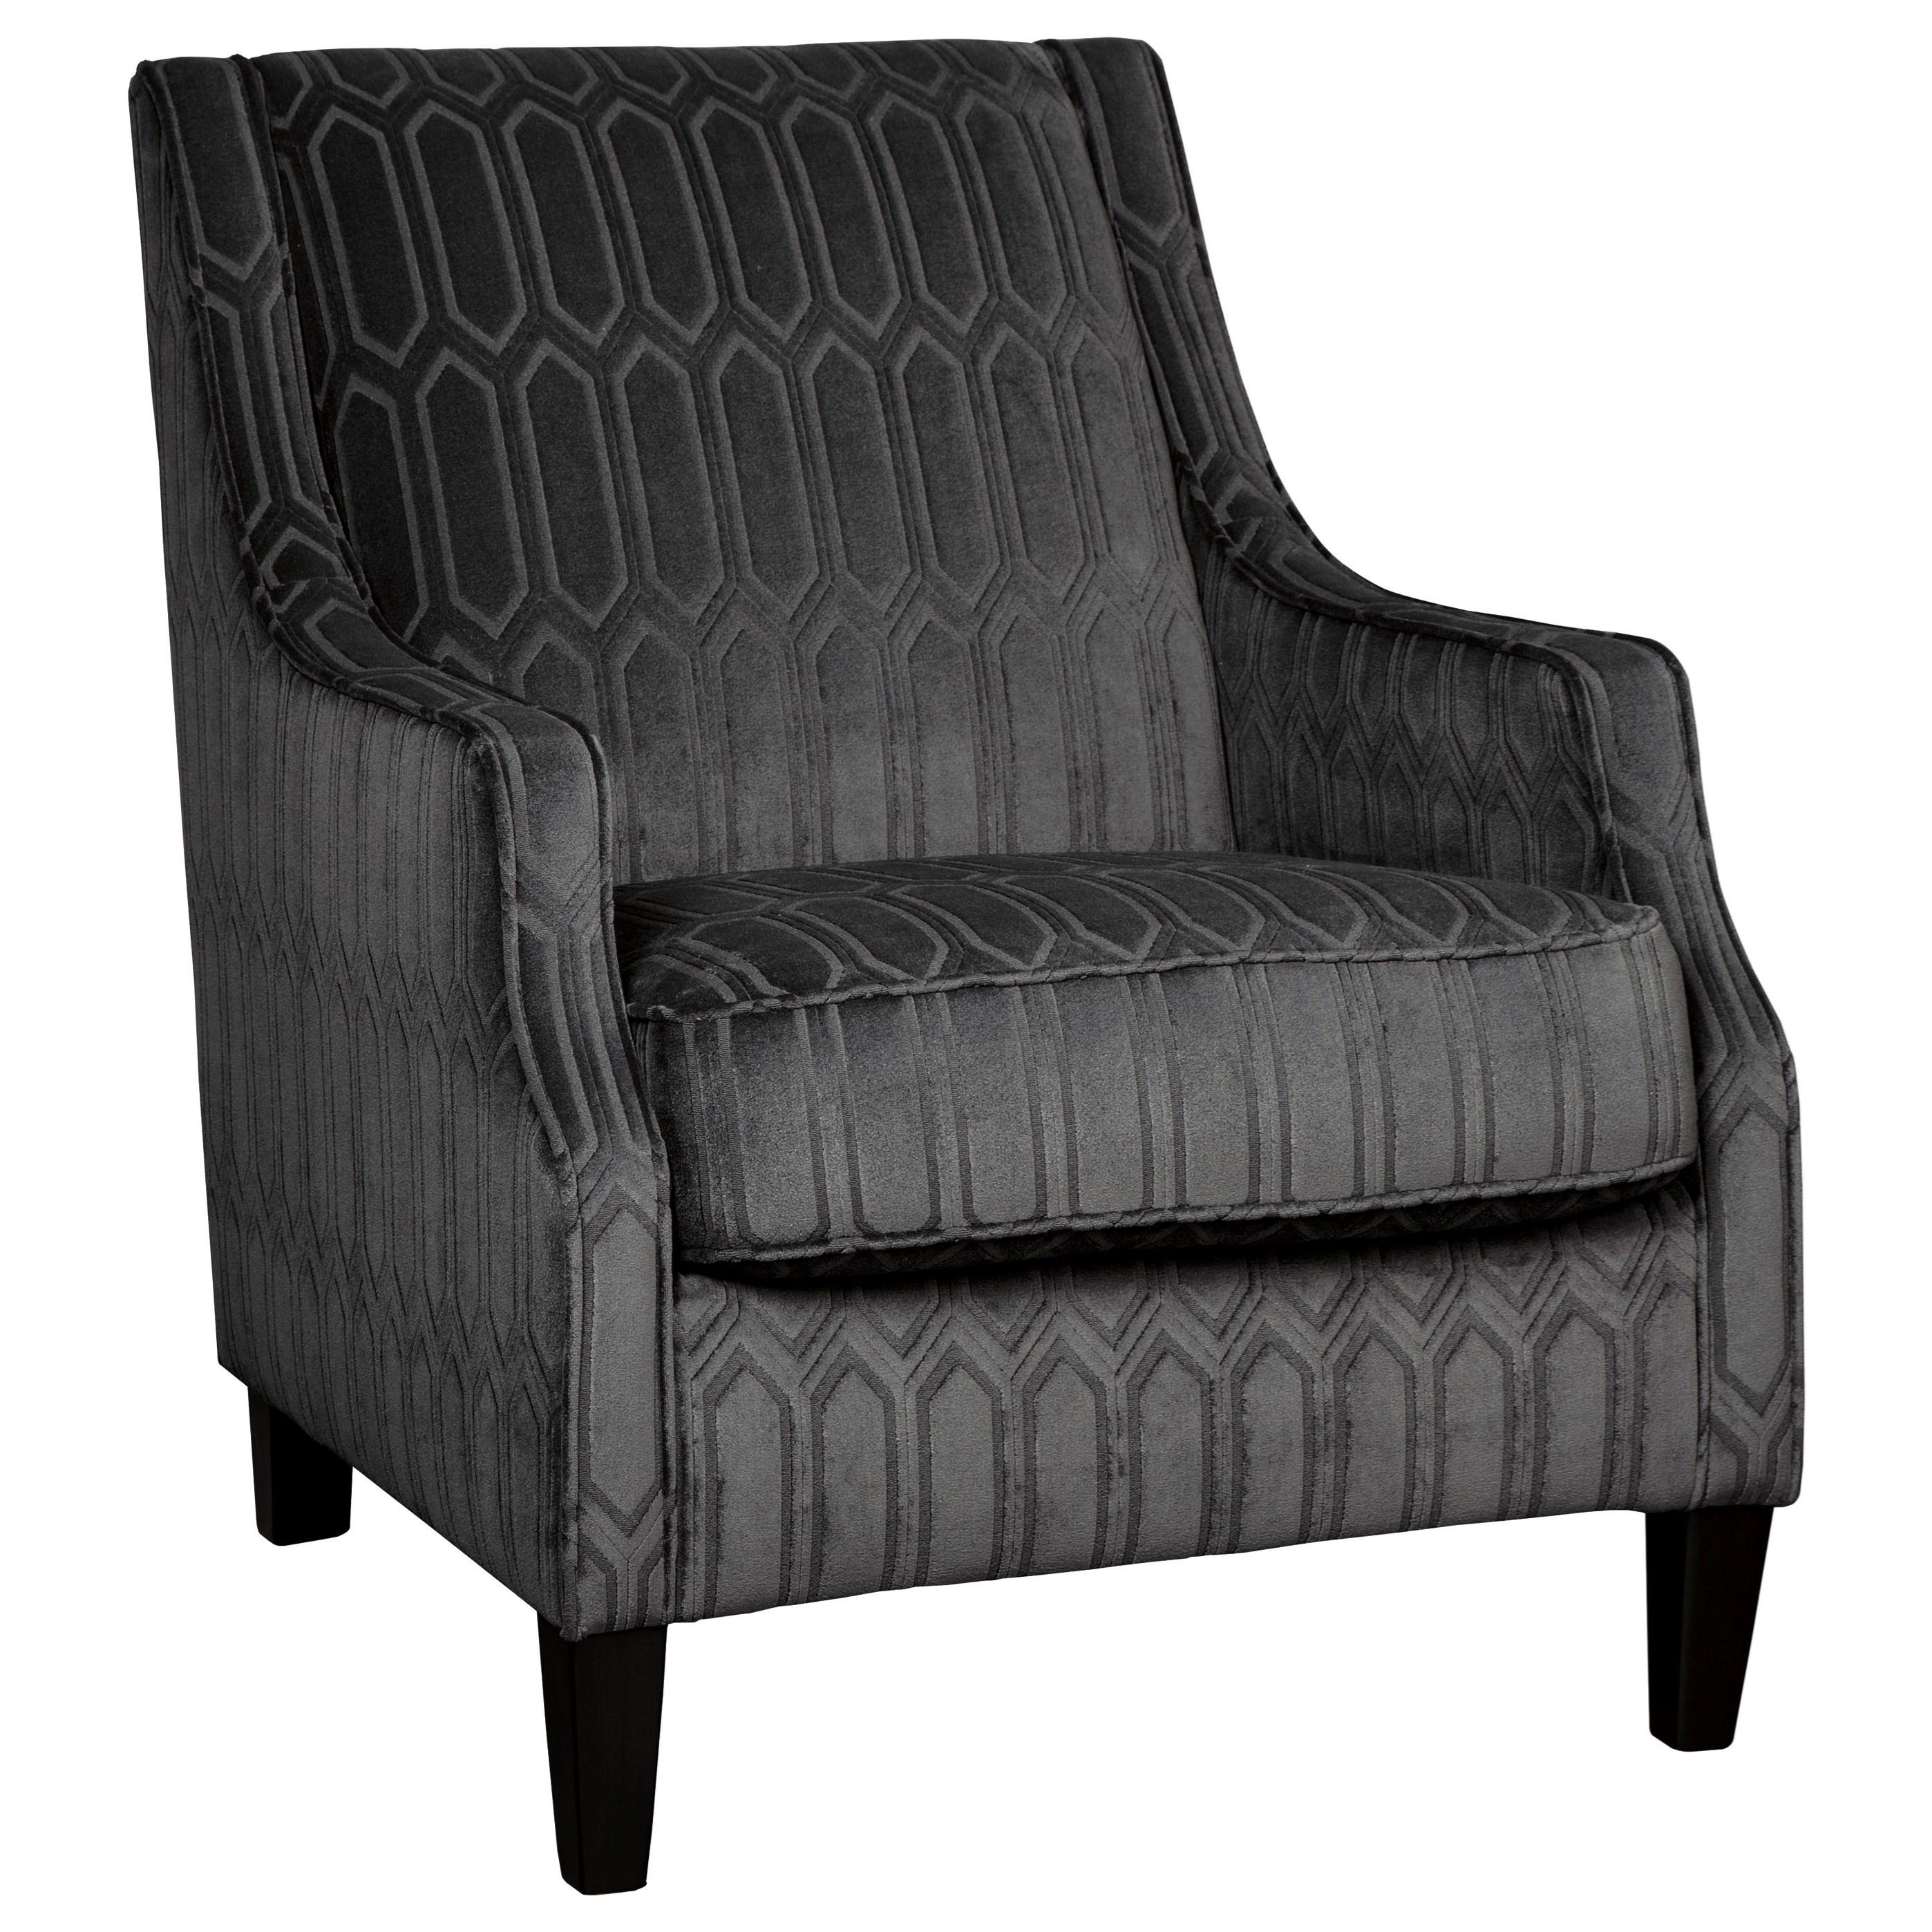 Millennium Entwine Accent Chair - Item Number: 4010121